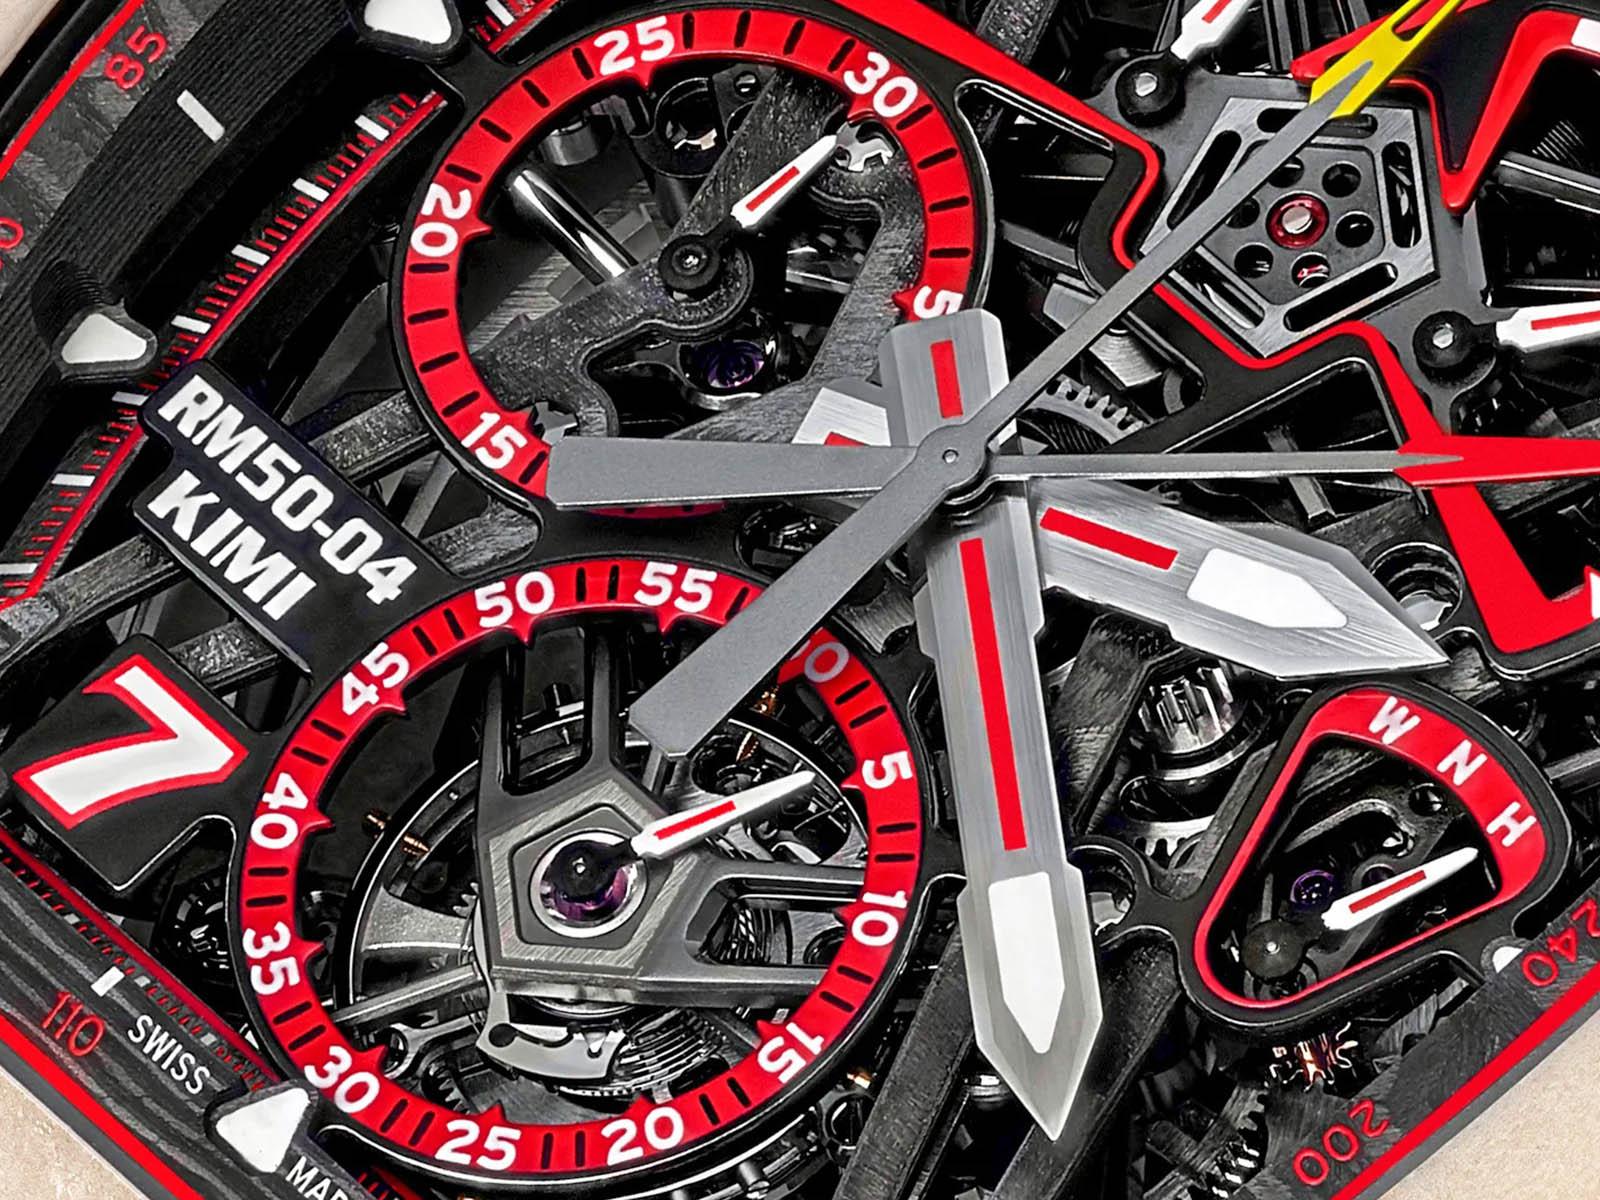 richard-mille-rm-50-04-tourbillon-split-seconds-chronograph-3.jpg